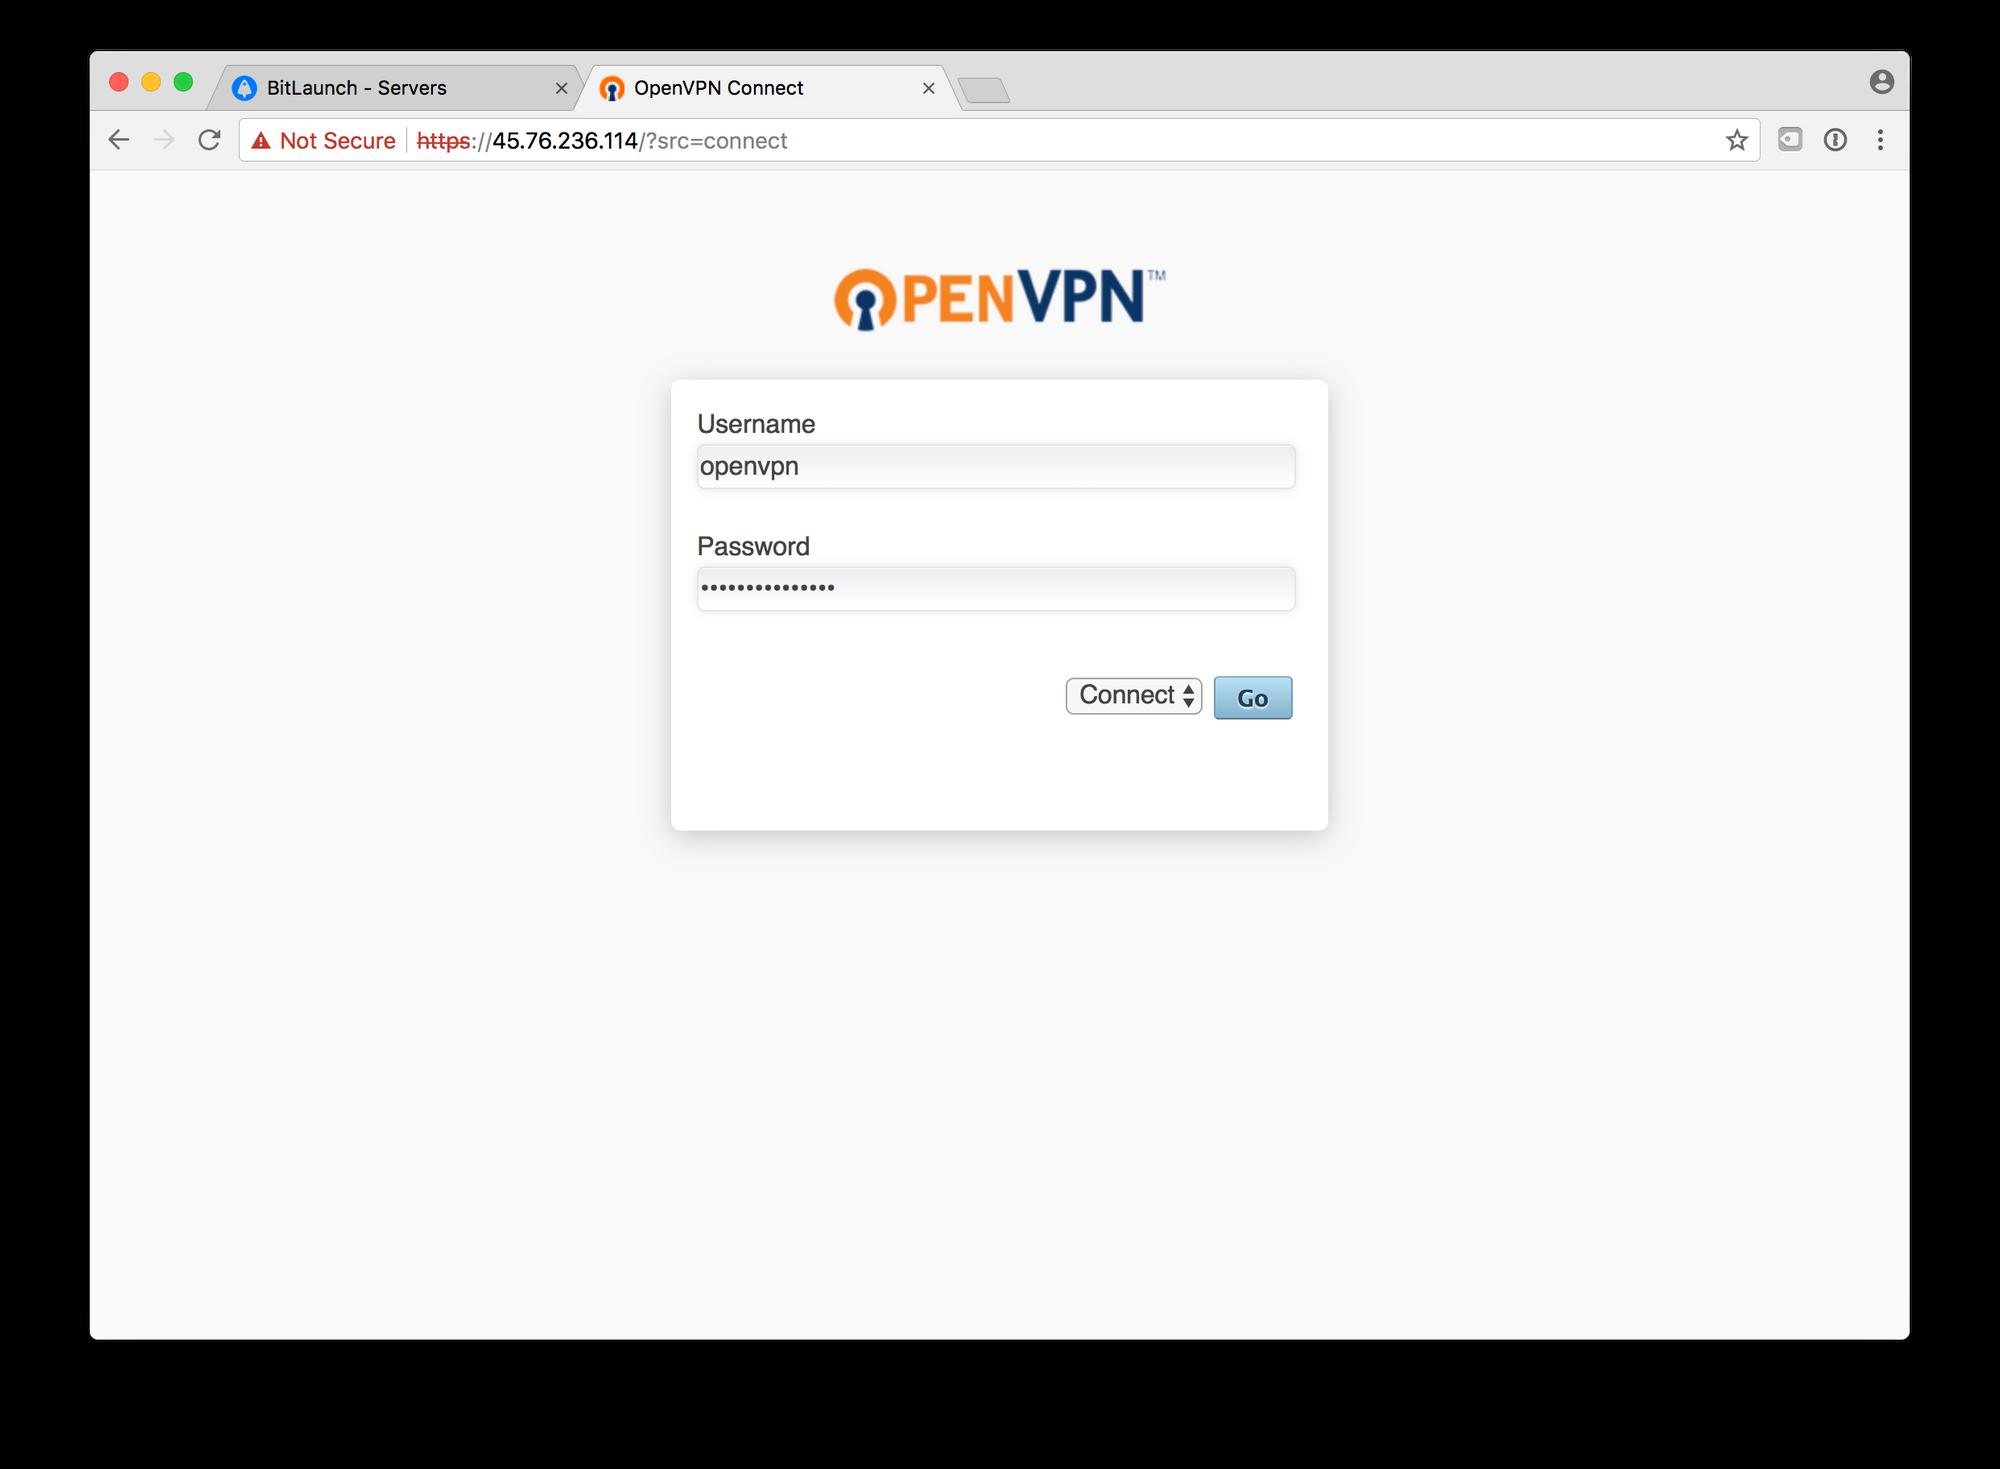 Bitlaunch Bitcoin VPN connect